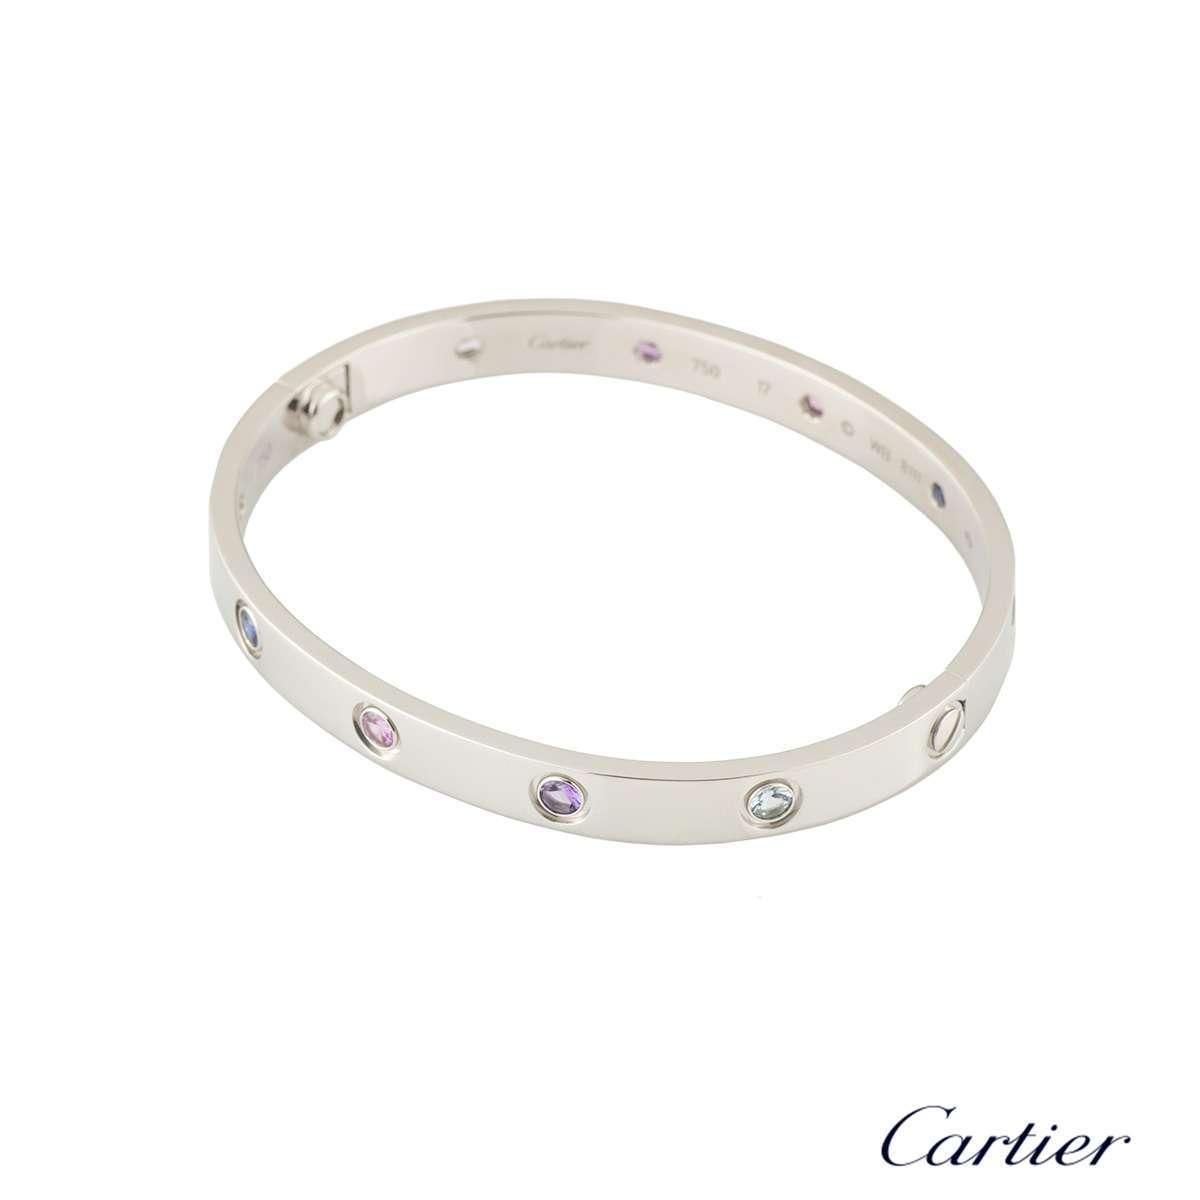 Cartier White Gold Coloured Stones Love Bracelet Size 17 B6036317